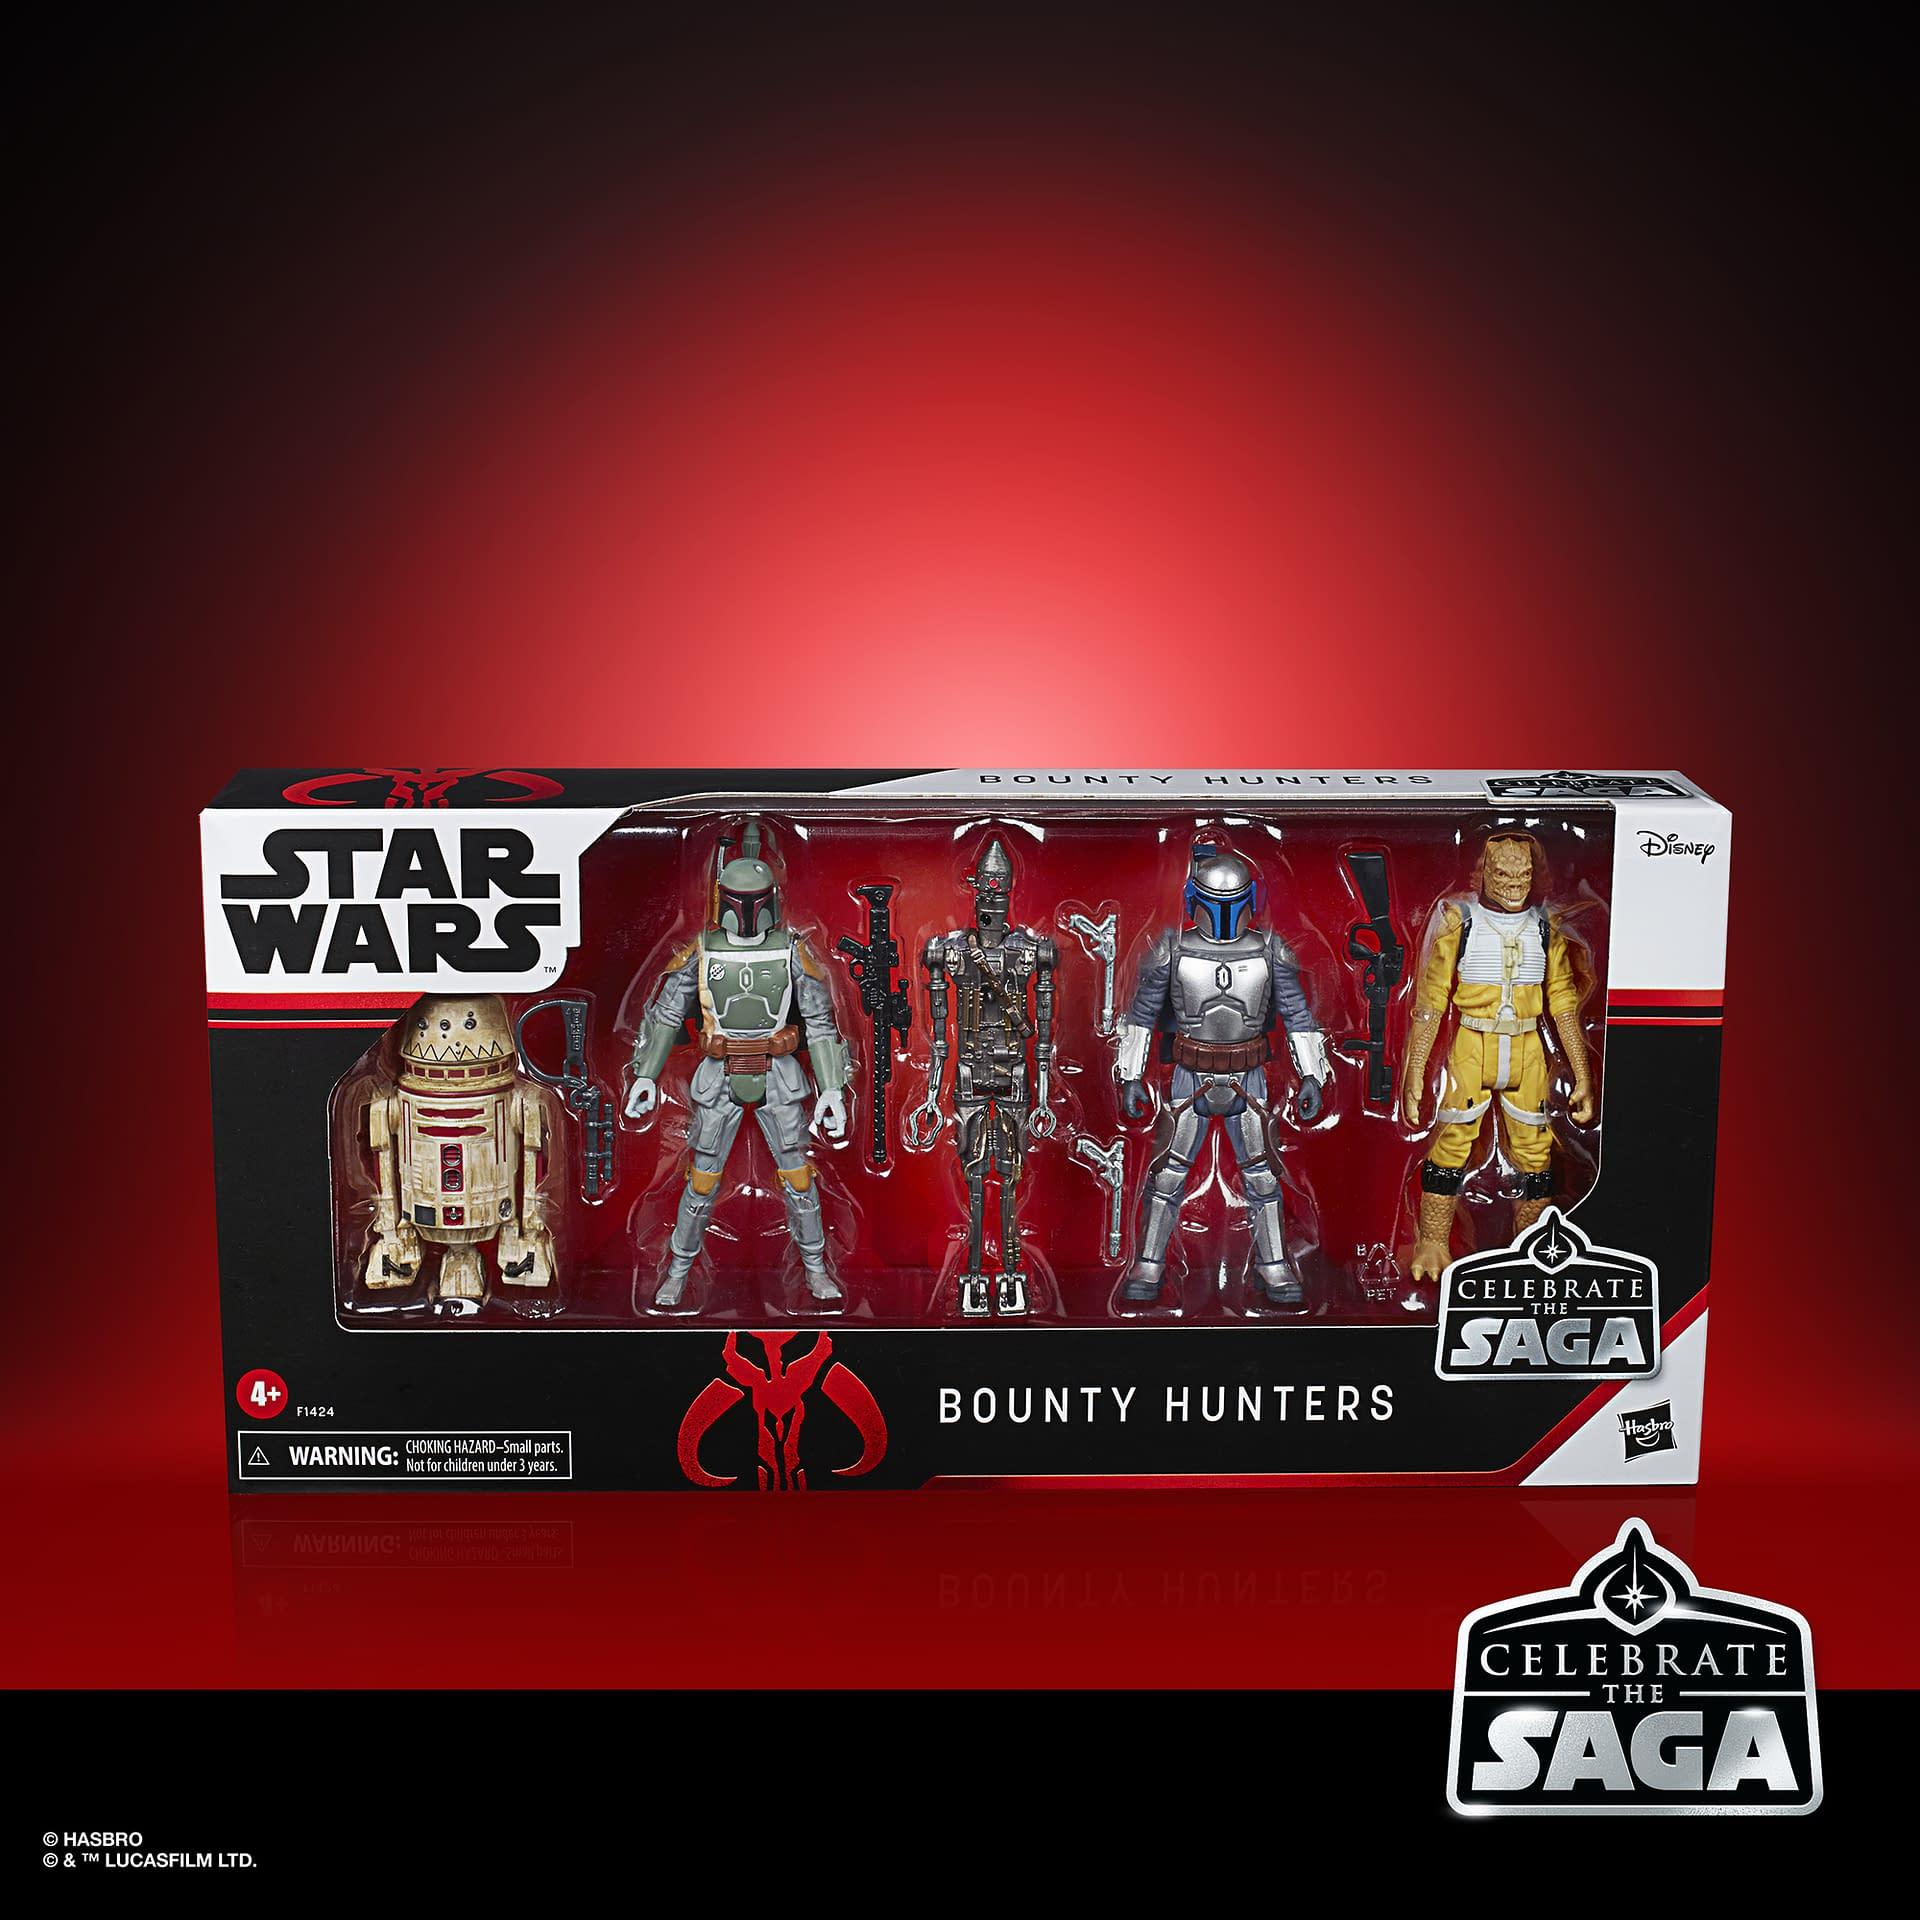 Star Wars célébrer la Saga Action Figures 5-Pack Galactic Empire